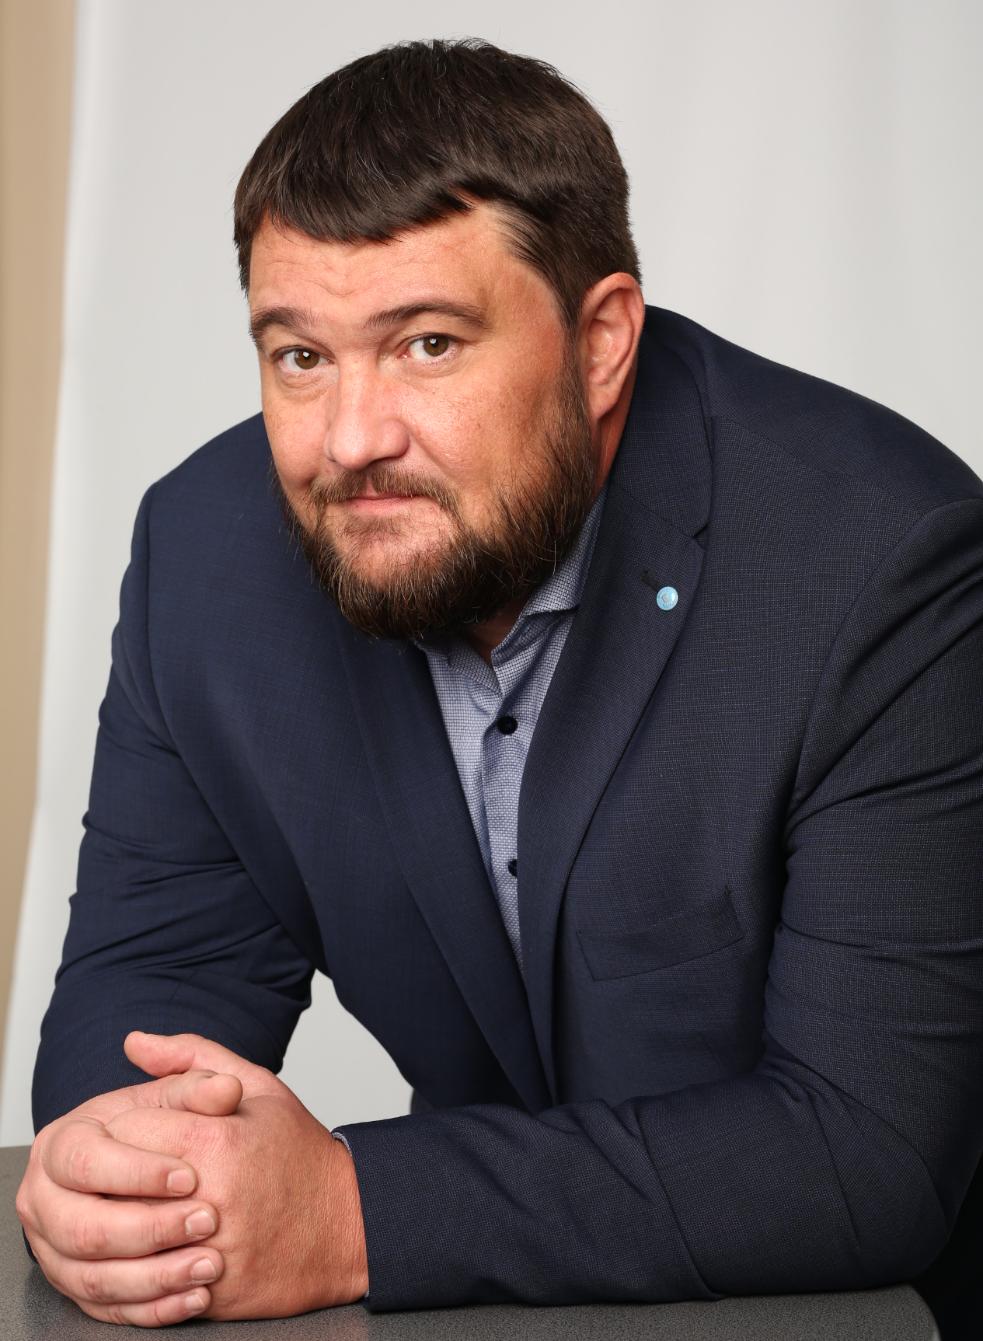 Глицос Георгий Владимирович